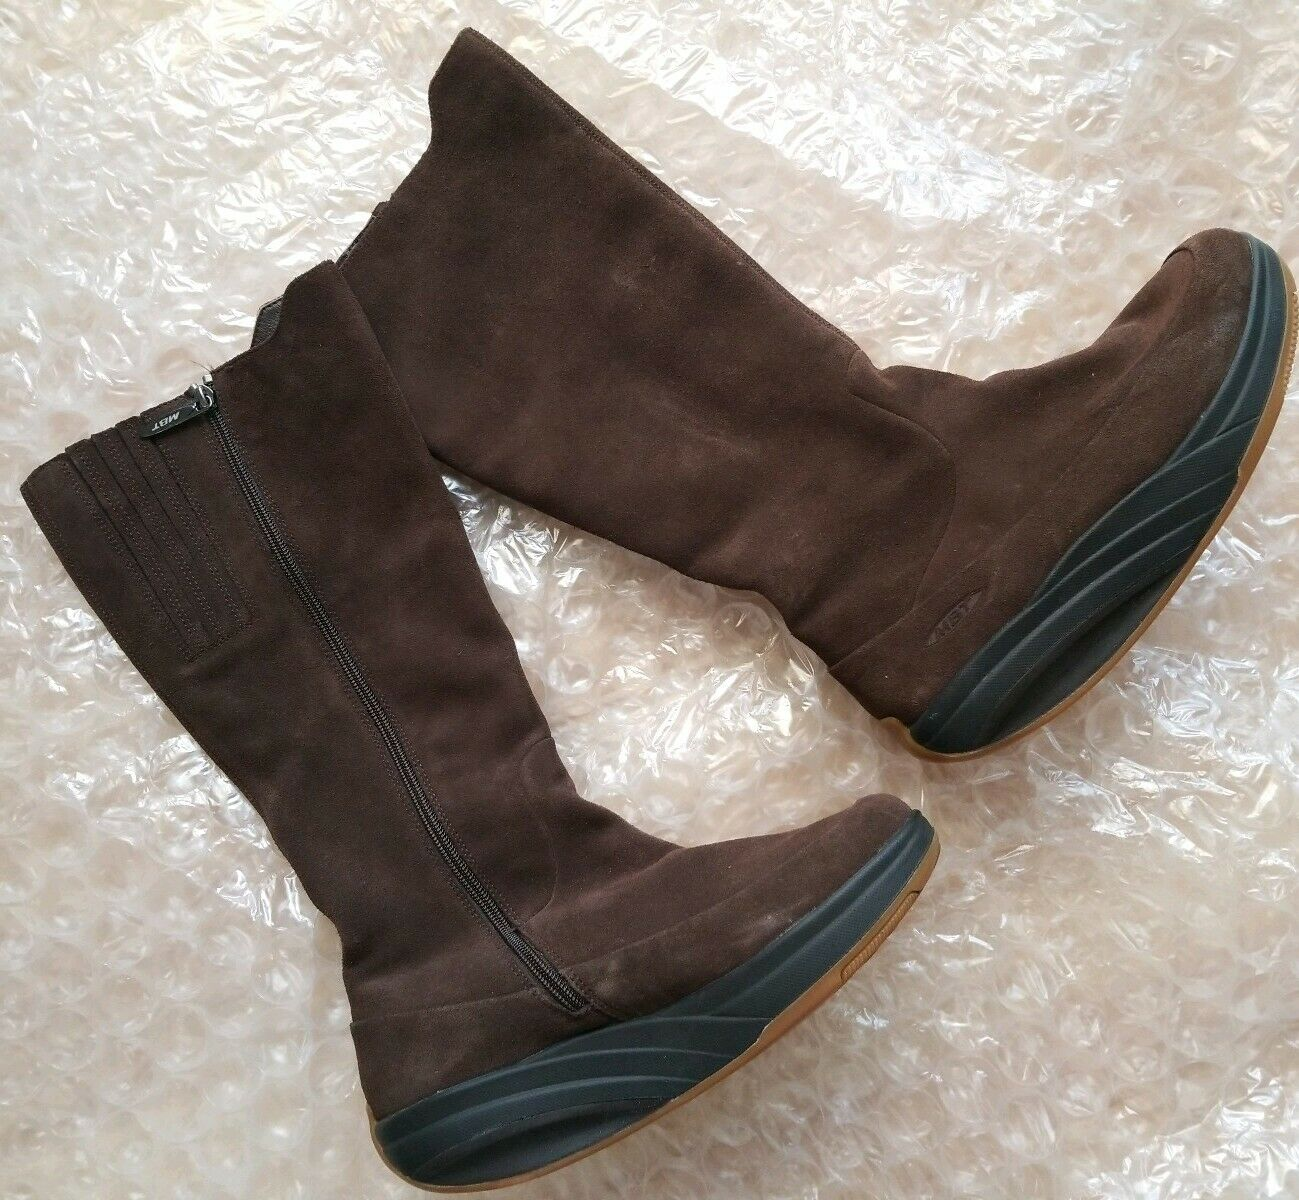 billig damen TAMBO MBT EUC Tall, Leather schwarz 7, Größe